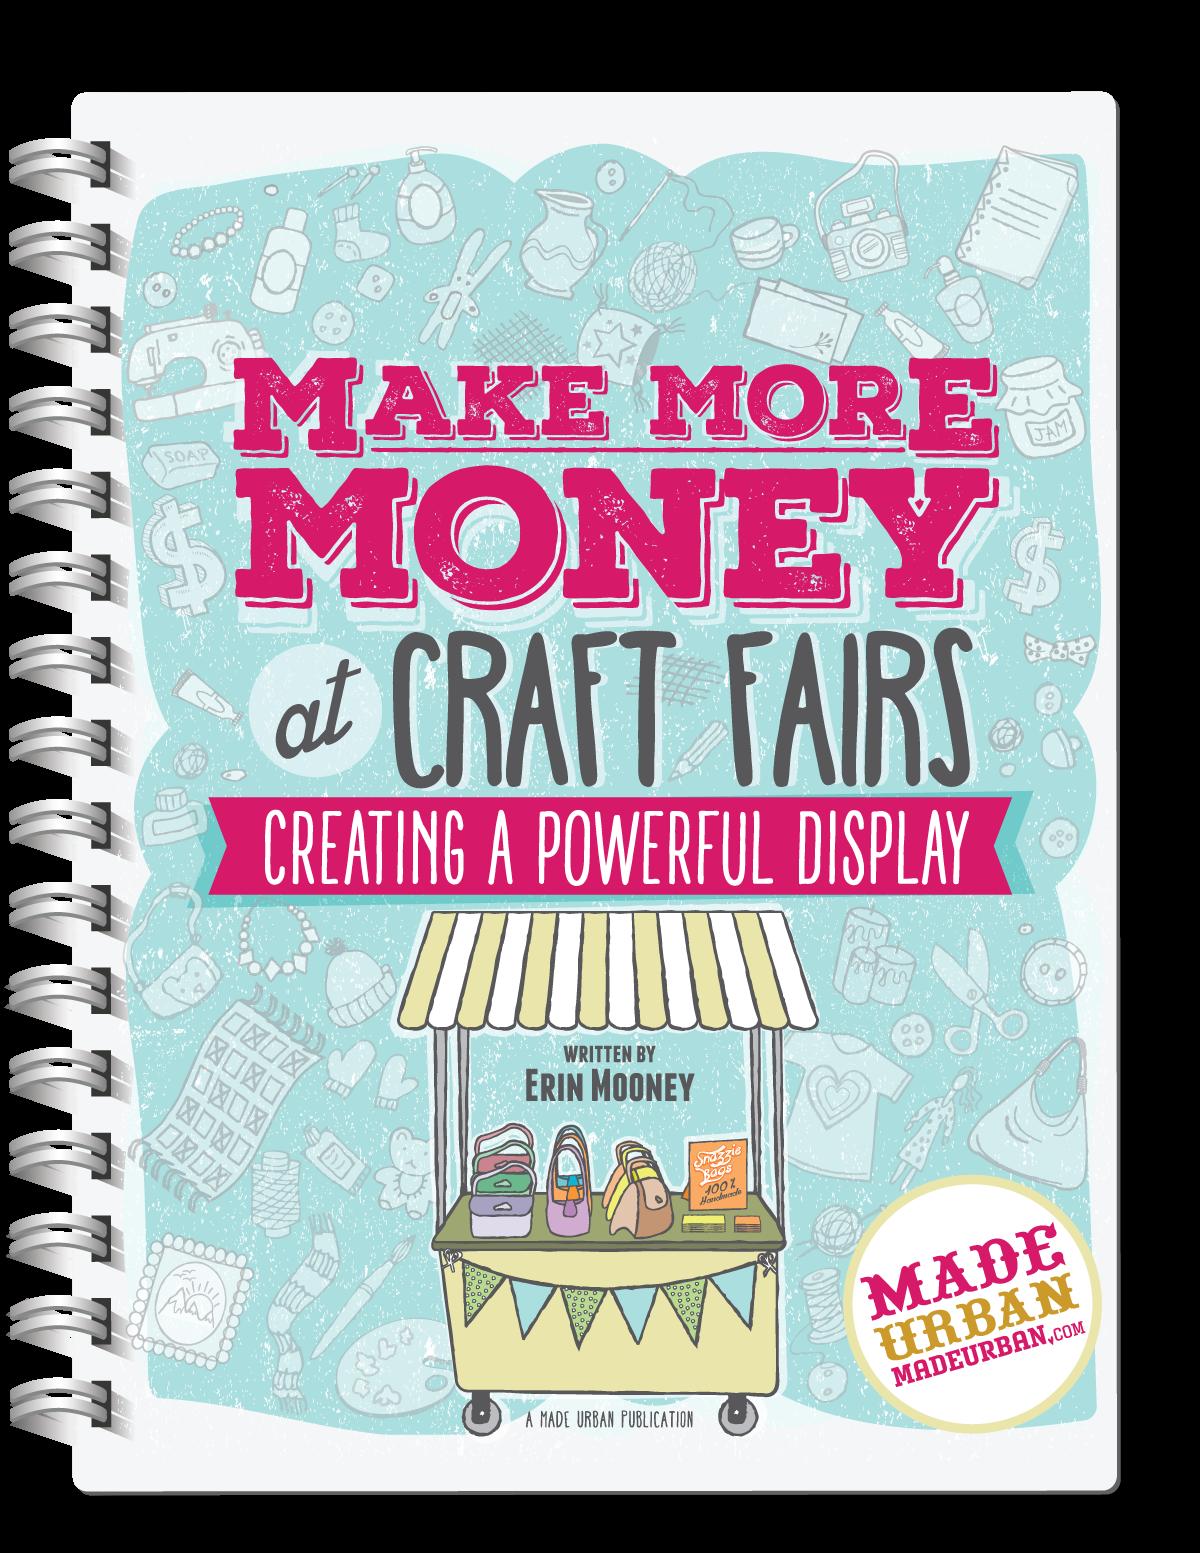 Make More Money at Craft Fairs - Creating a Powerful Display ebook